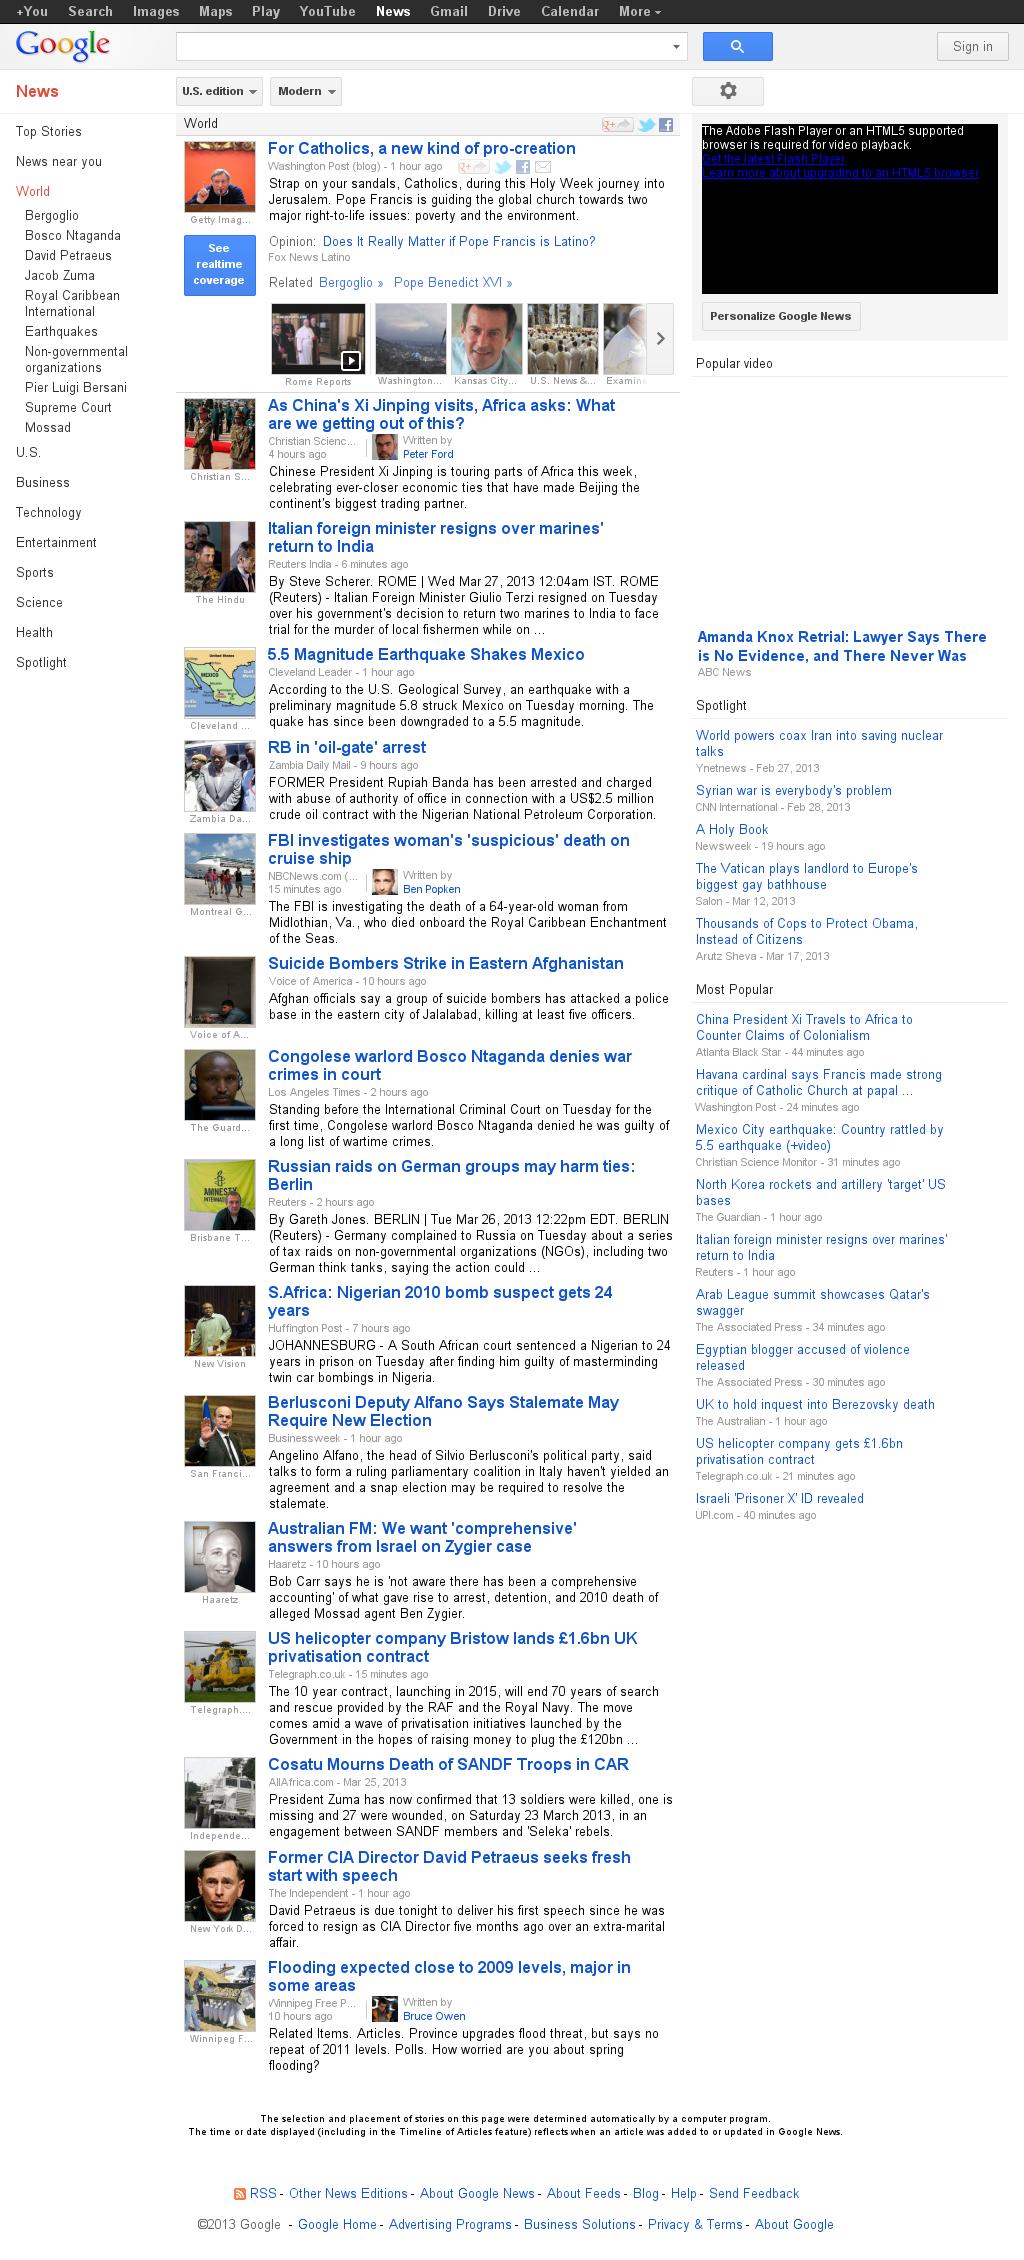 Google News: World at Tuesday March 26, 2013, 7:16 p.m. UTC